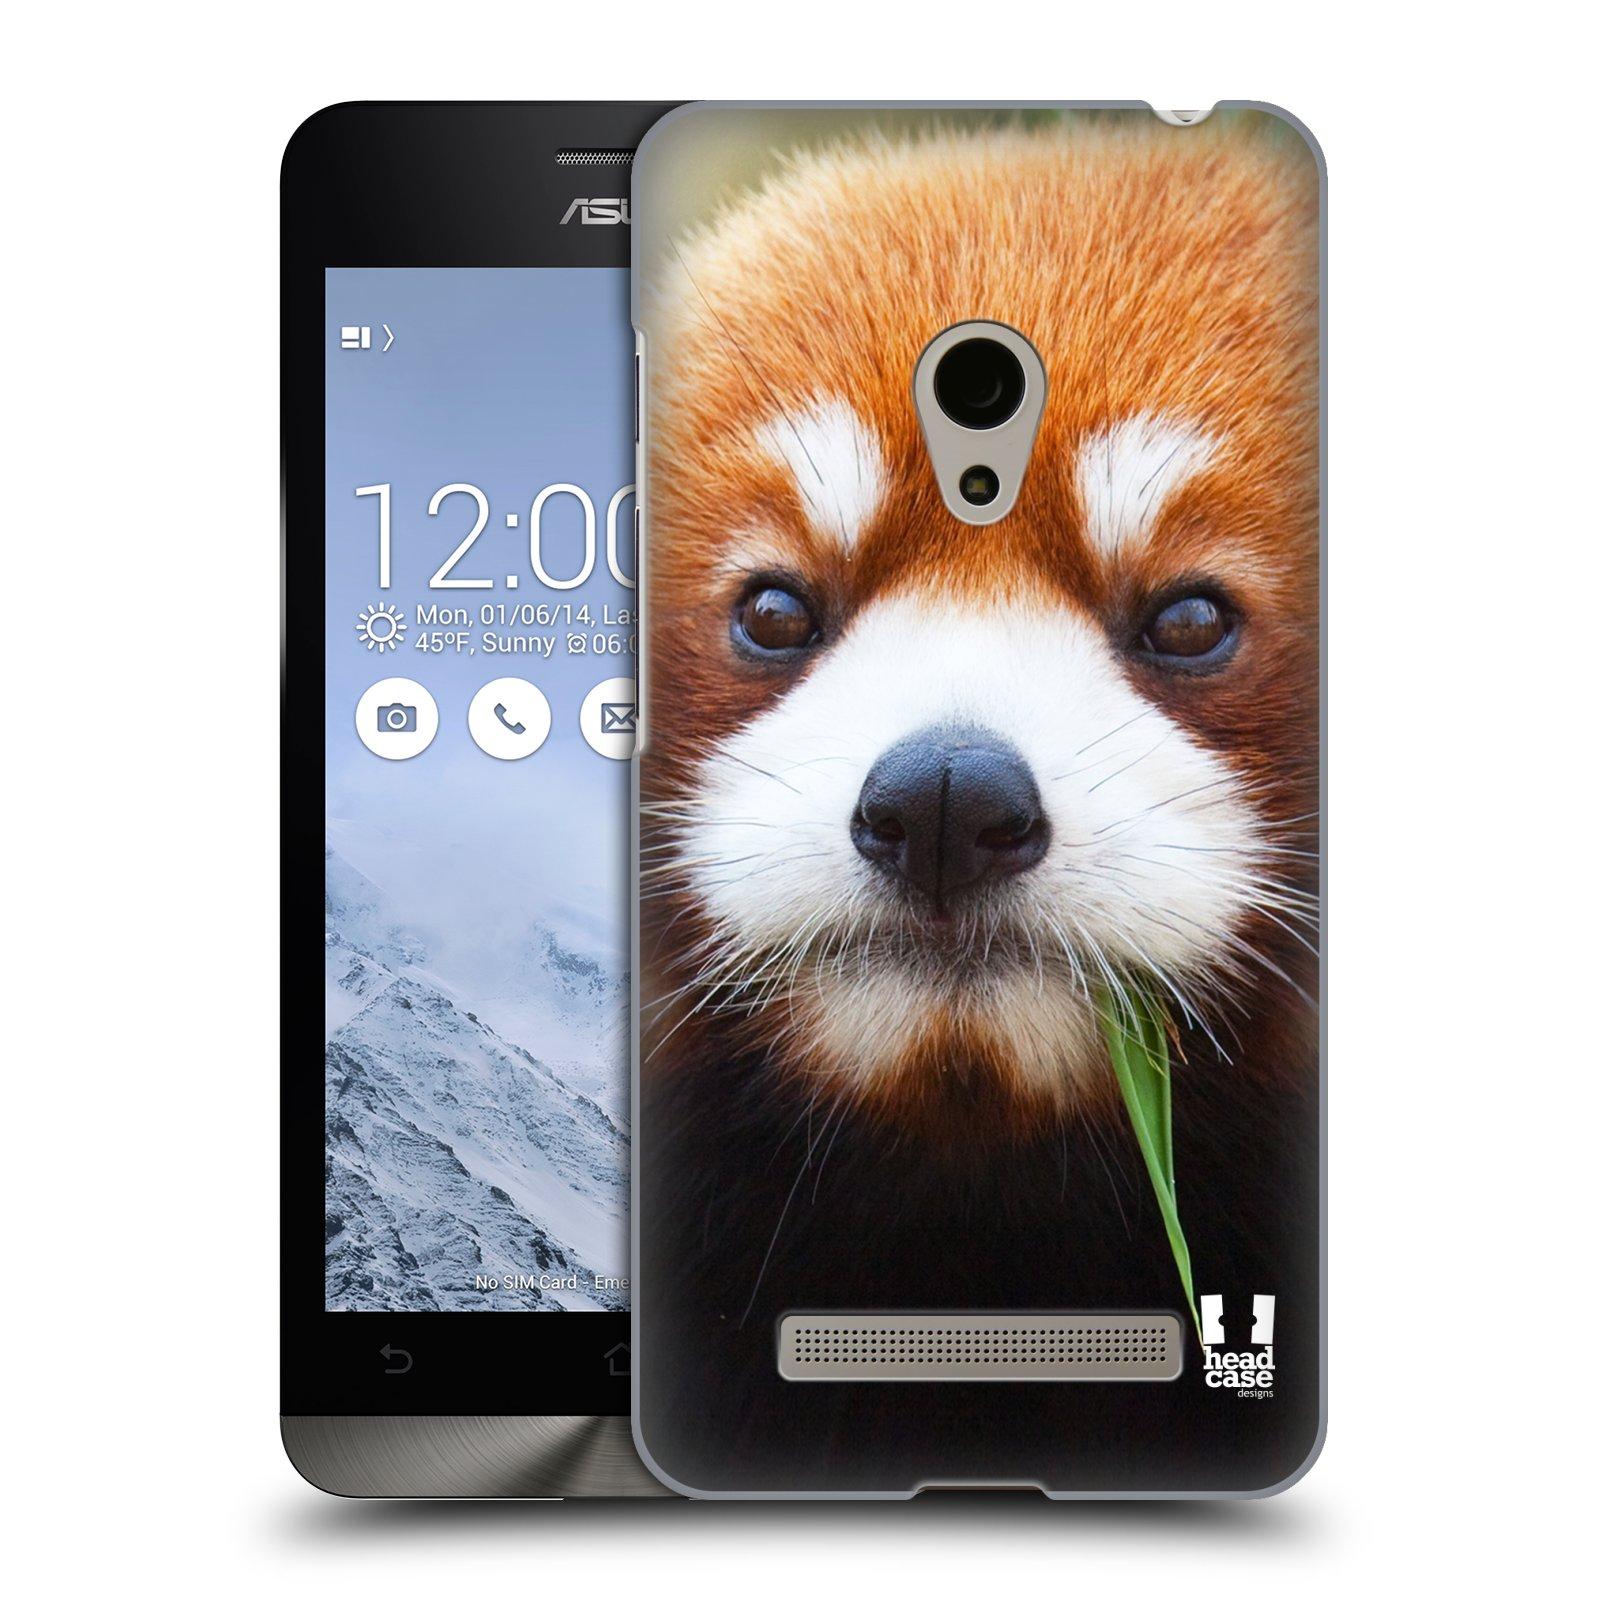 HEAD CASE plastový obal na mobil Asus Zenfone 5 vzor Divočina, Divoký život a zvířata foto PANDA HNĚDÁ